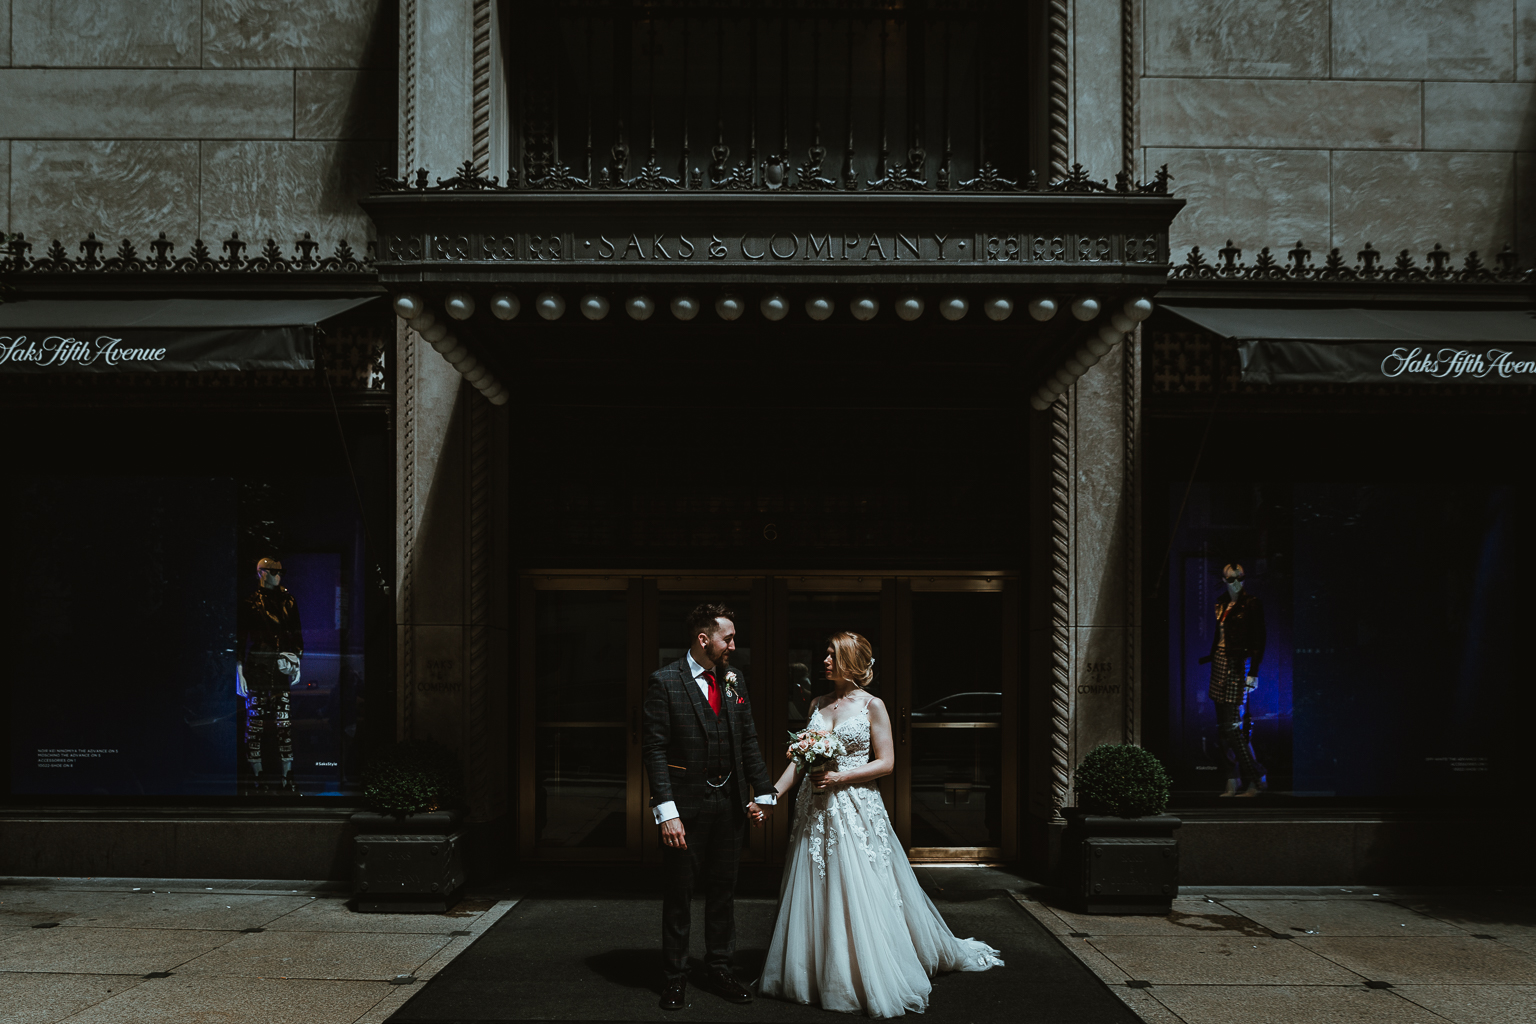 New York Manhattan Central Park Wedding Photographer-101.jpg